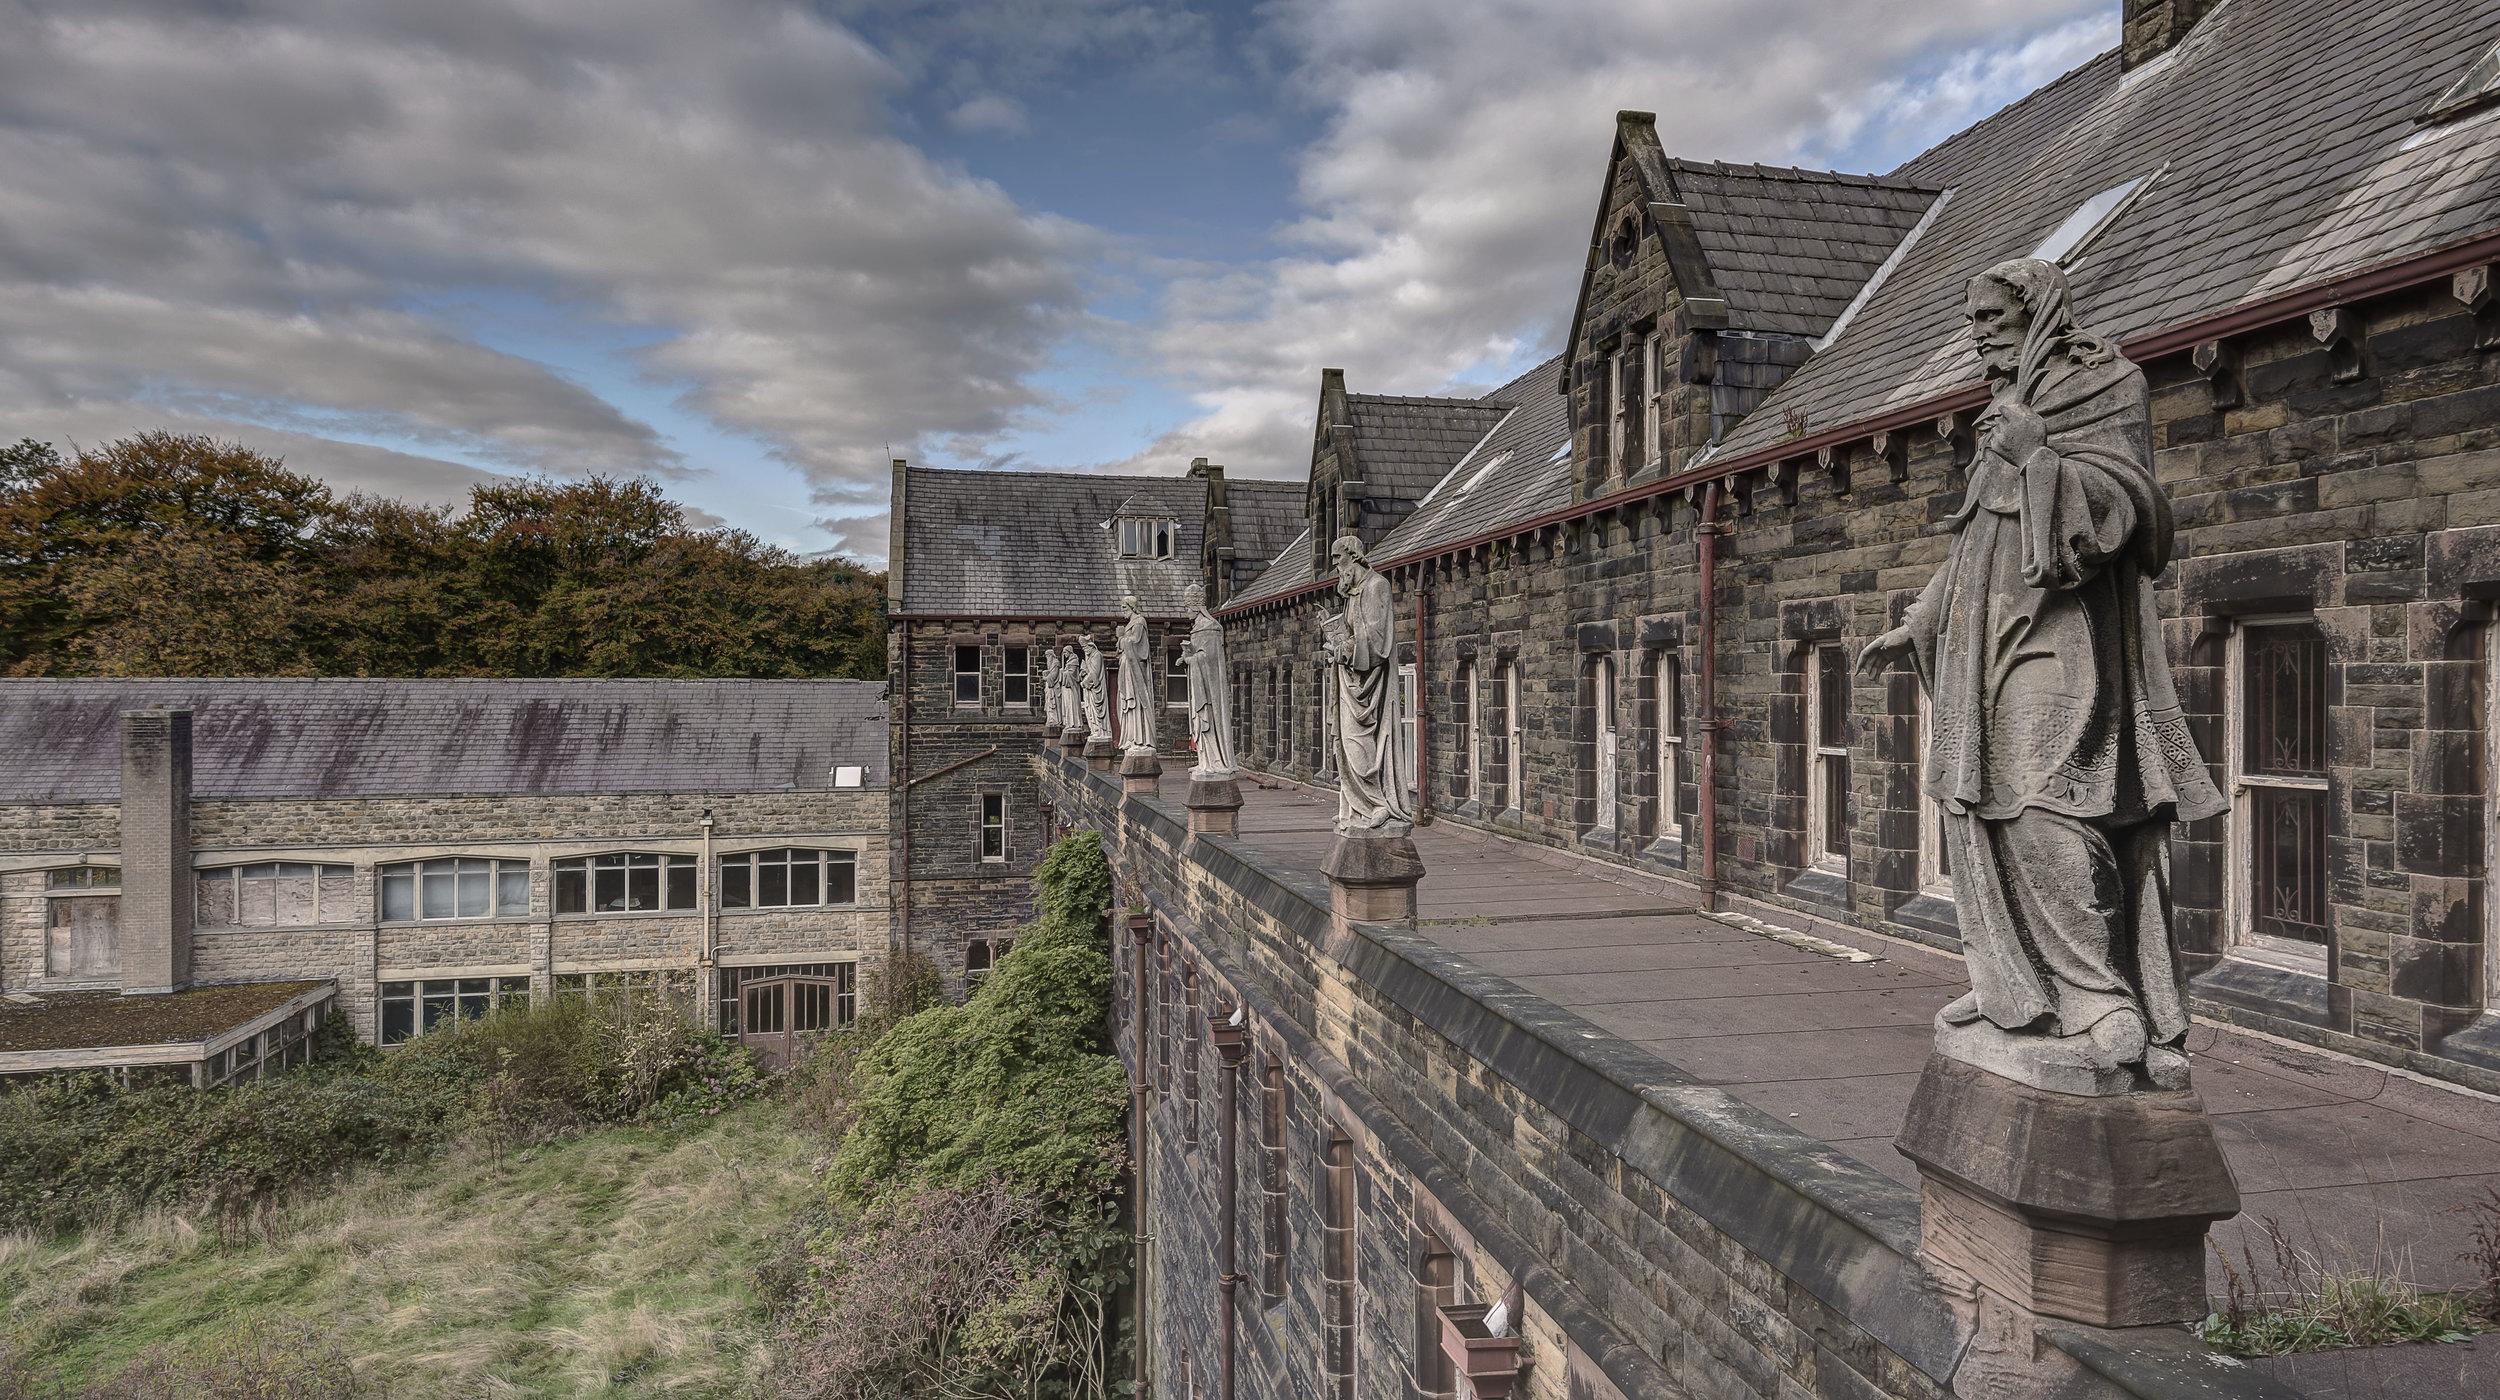 St Josephs Seminary - The Guardians